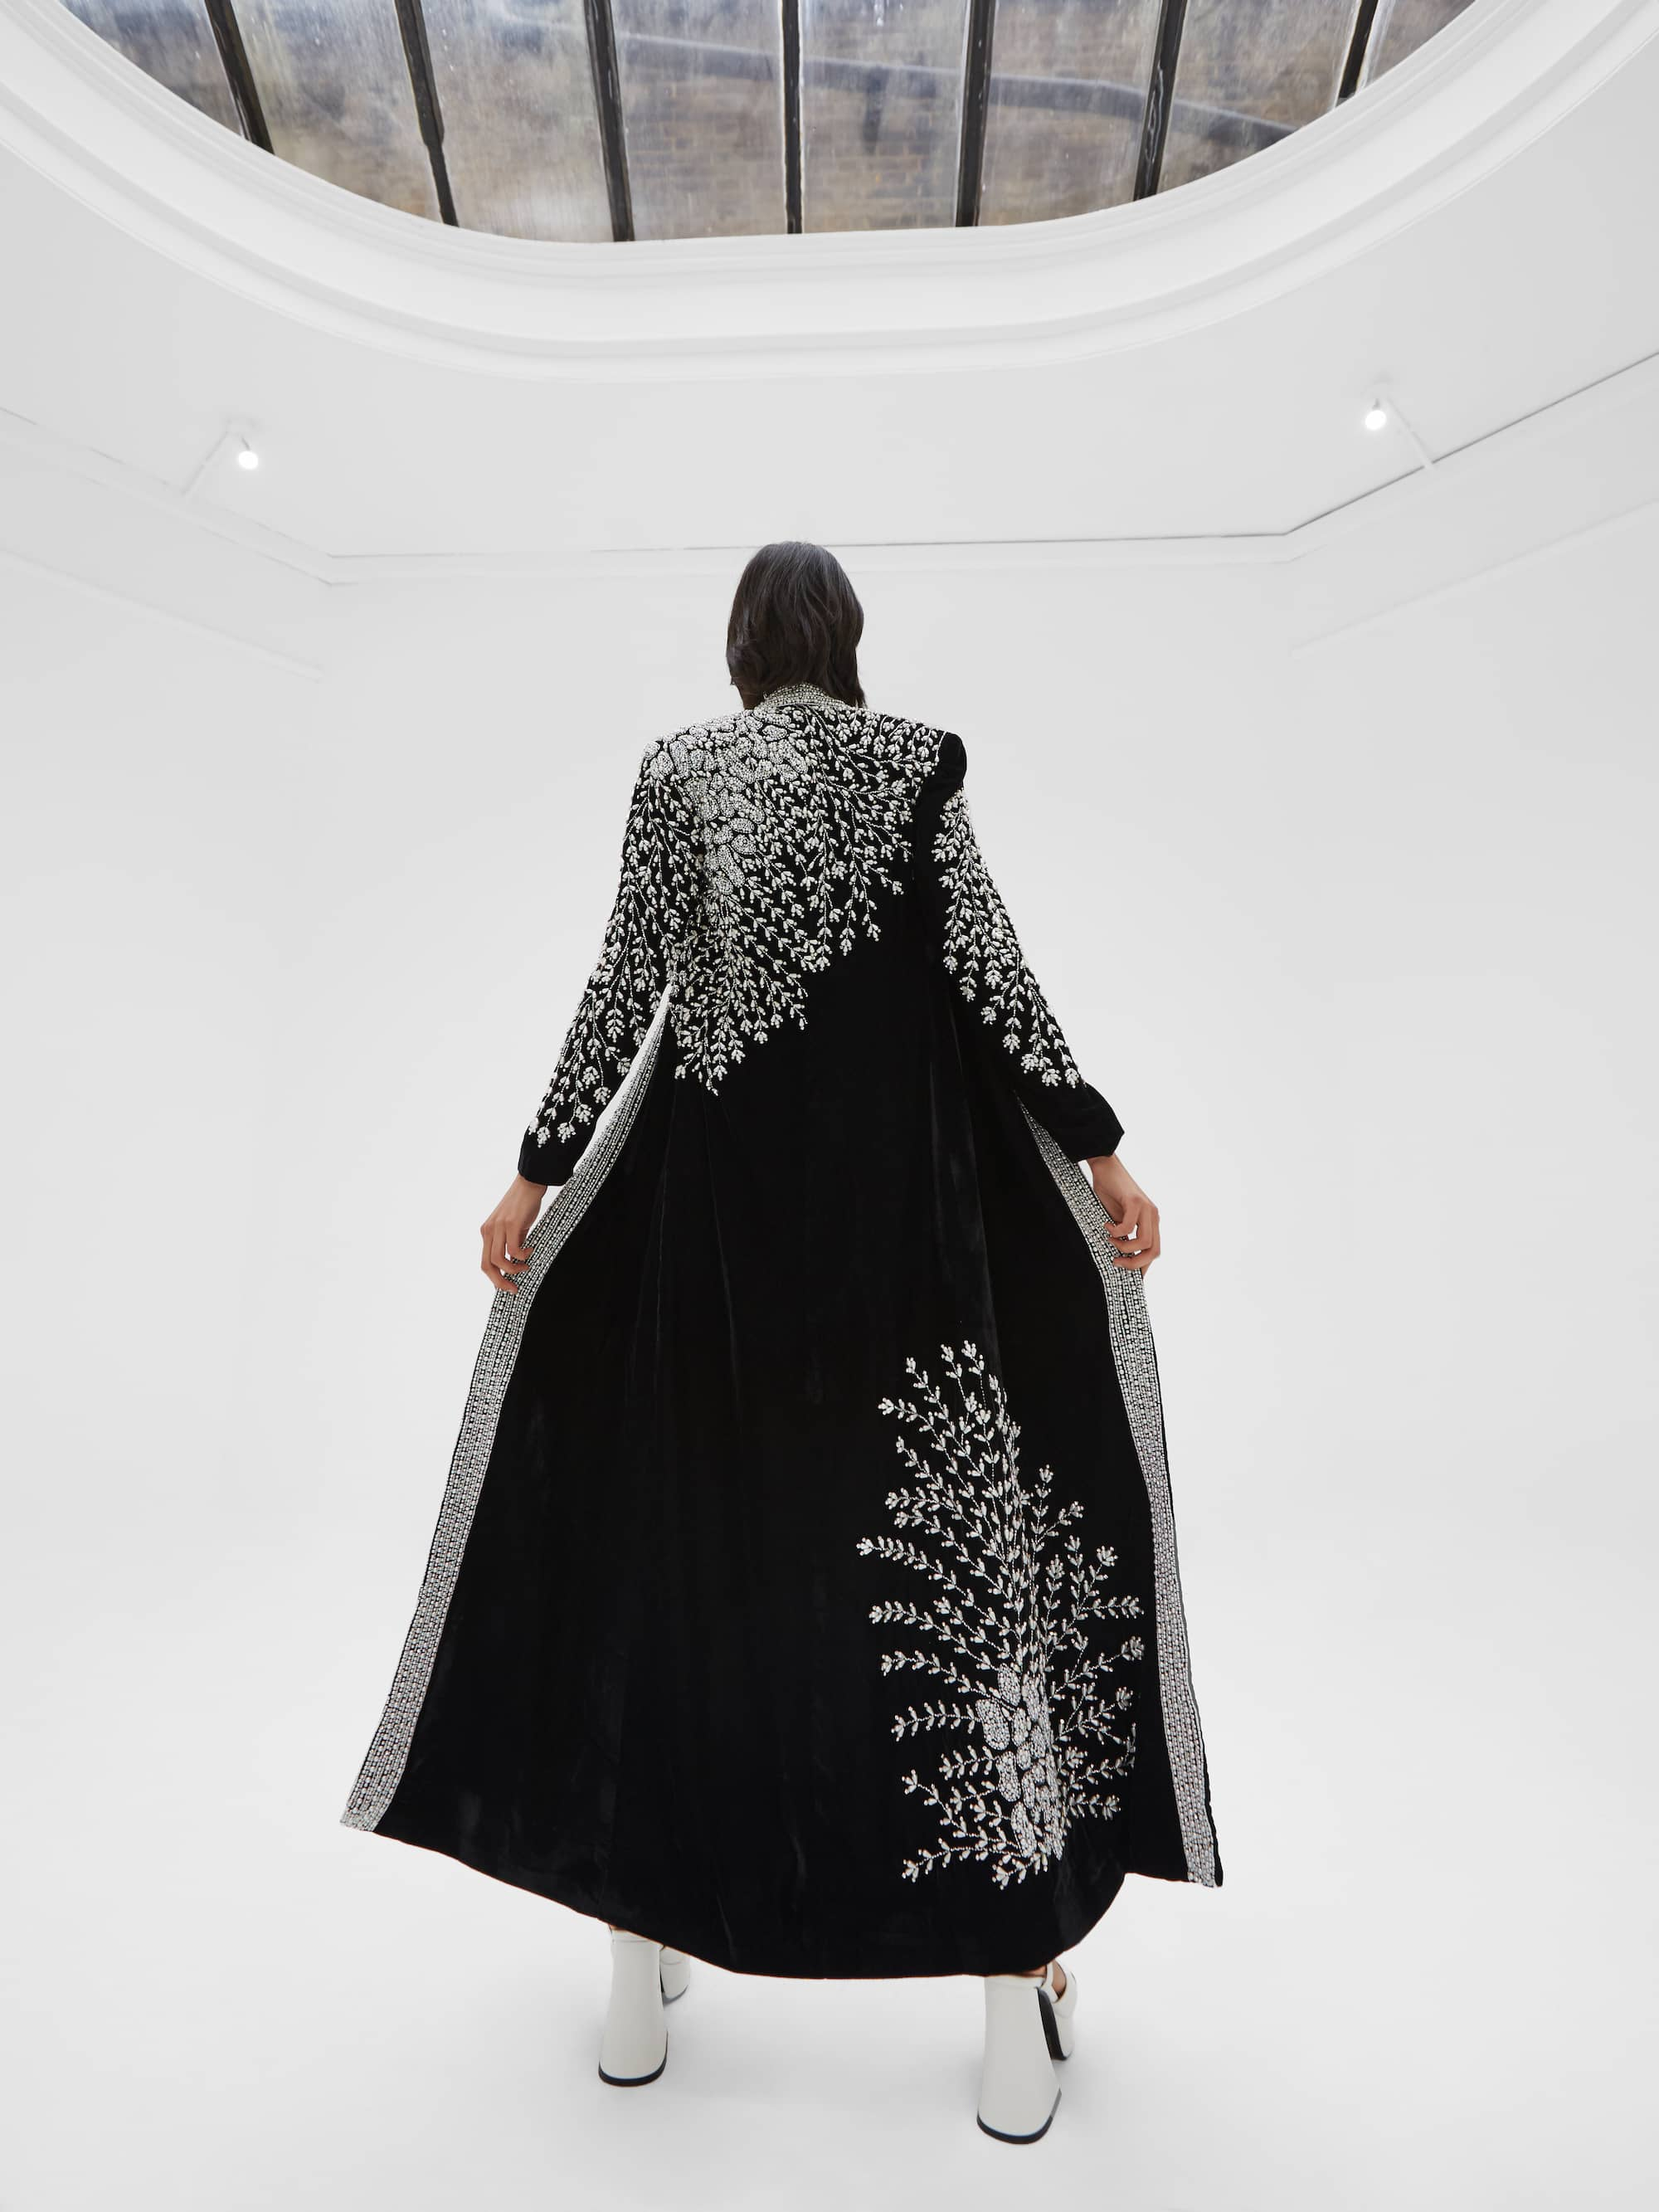 View 2 of model wearing Kamia Kimono in black.